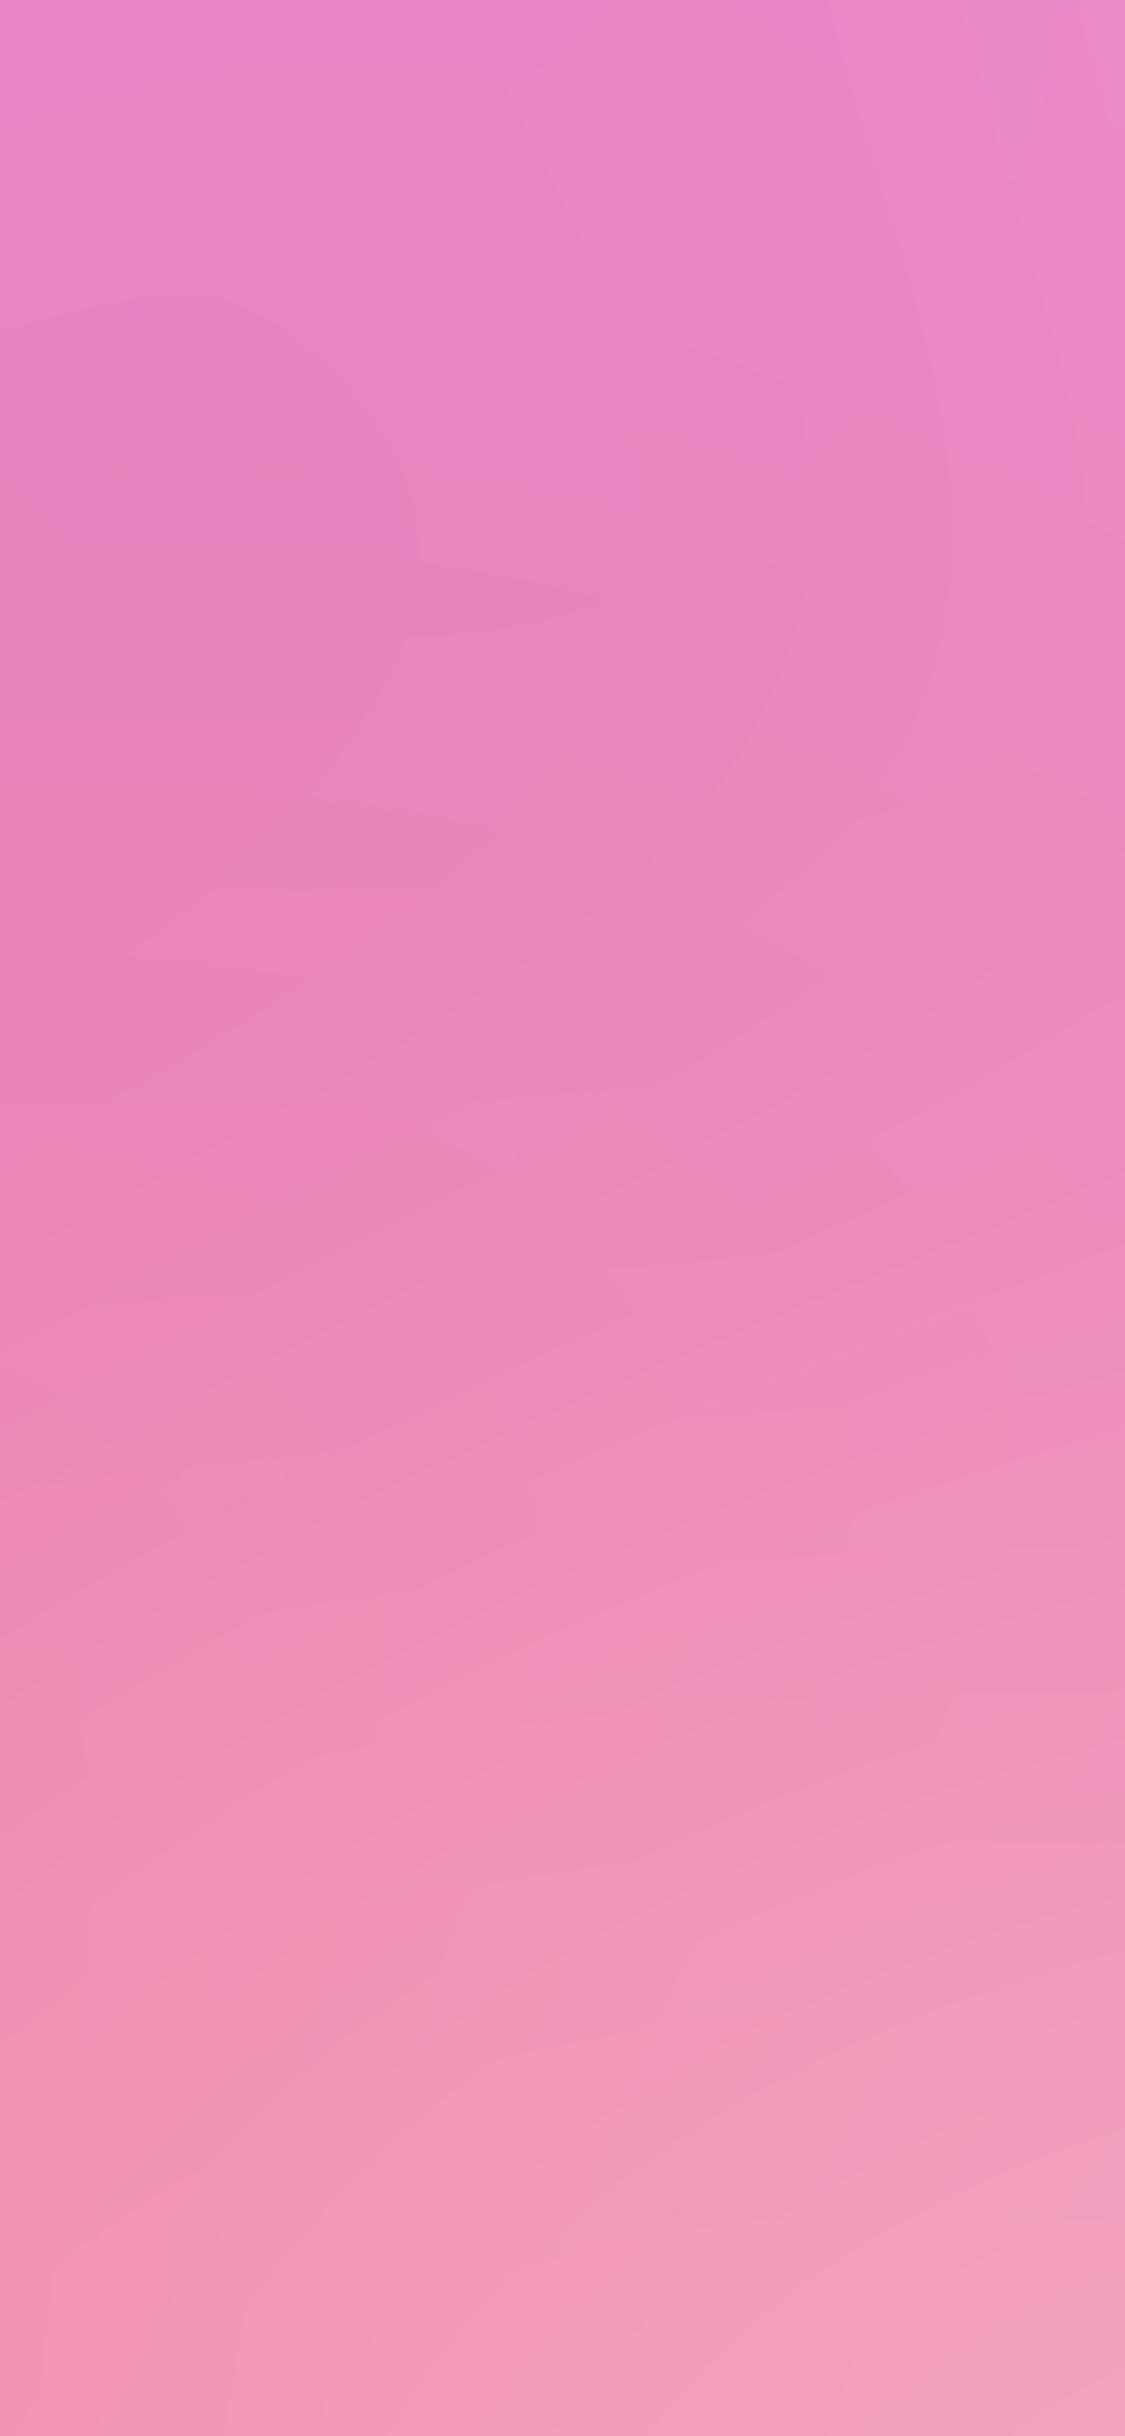 Iphonexpapers Se52 Baby Pink Gradation Blur